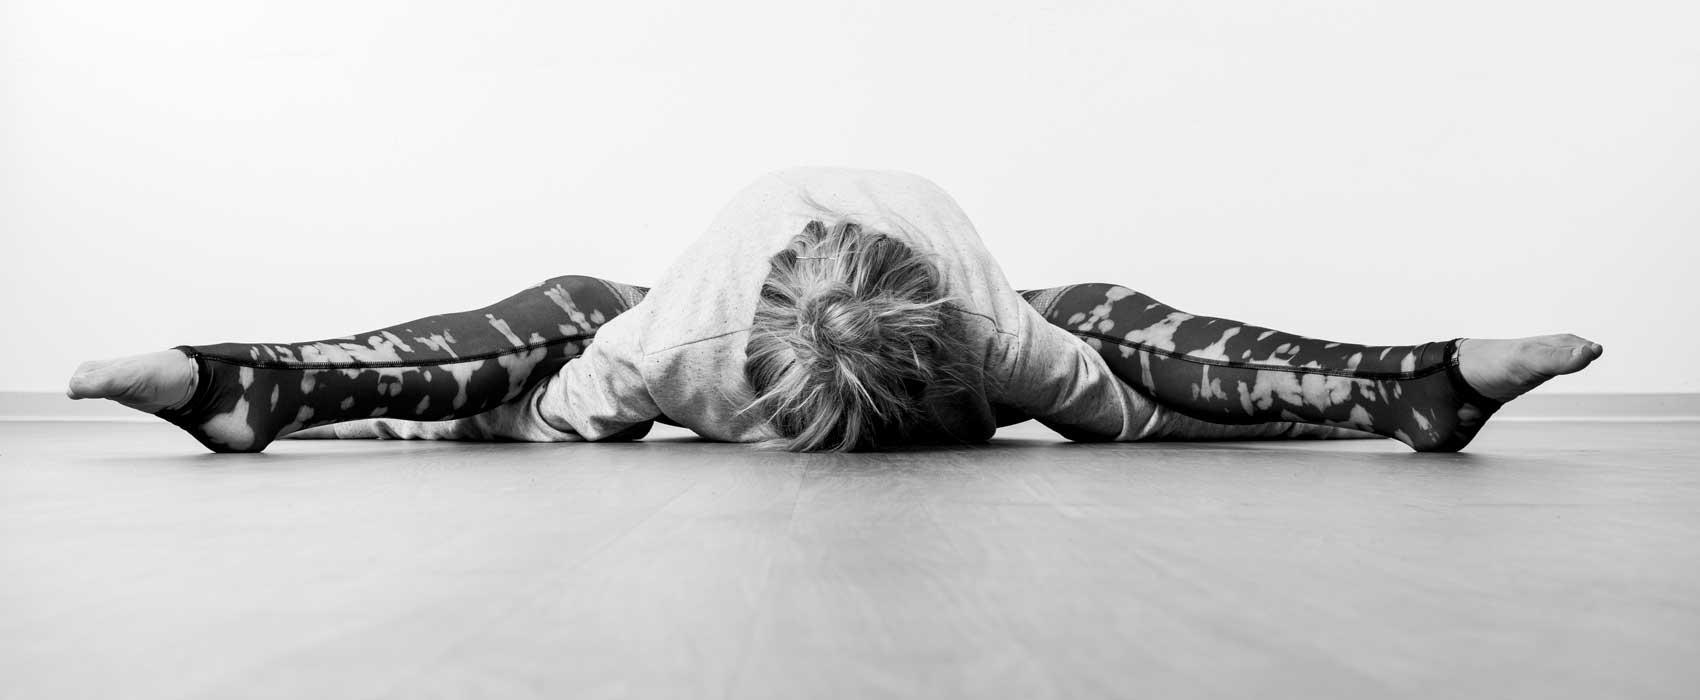 O.MY.YOGA Ulm,, Anna Altrichter Yoga Lehrerin Ashtanga/Hatha und RYT500h aus Ulm. Yoga Kurse für Asthanga, Vinyasa und Hatha. Yoga Kurse für Firmen, Kooperationen mit Firmen.